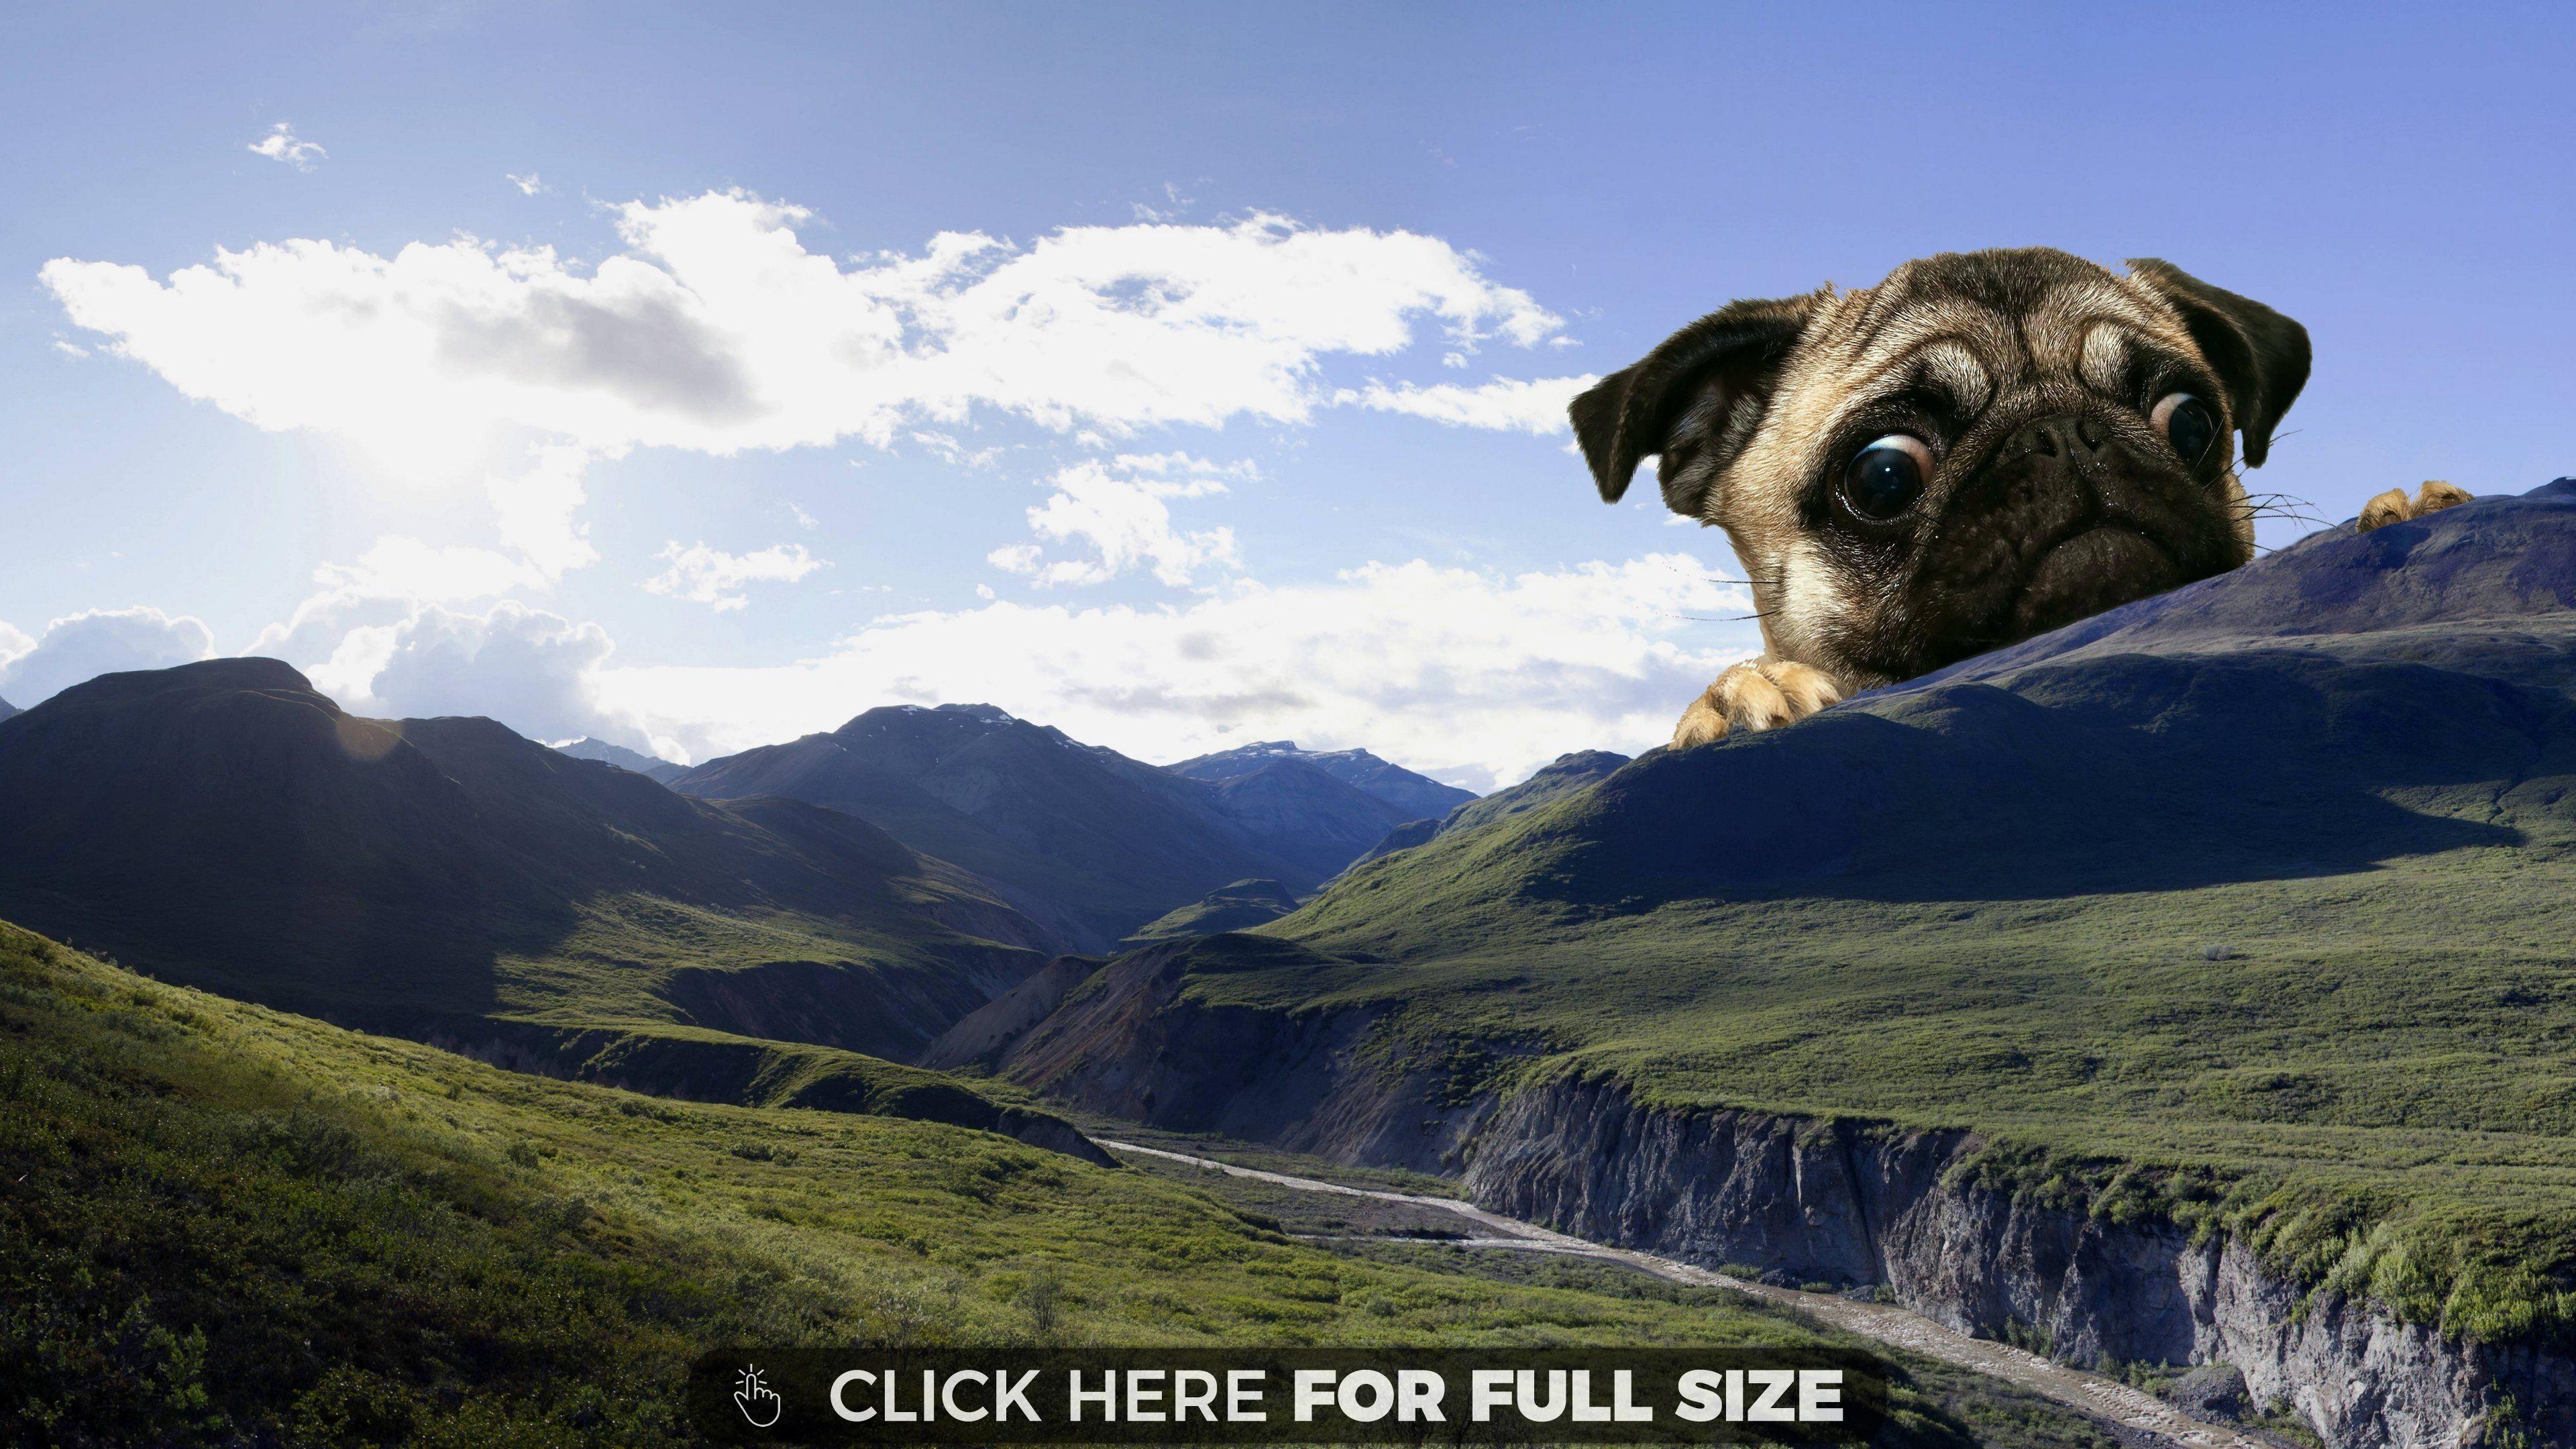 Giant Pug Background Hd Wallpaper Pugs Hd Wallpaper